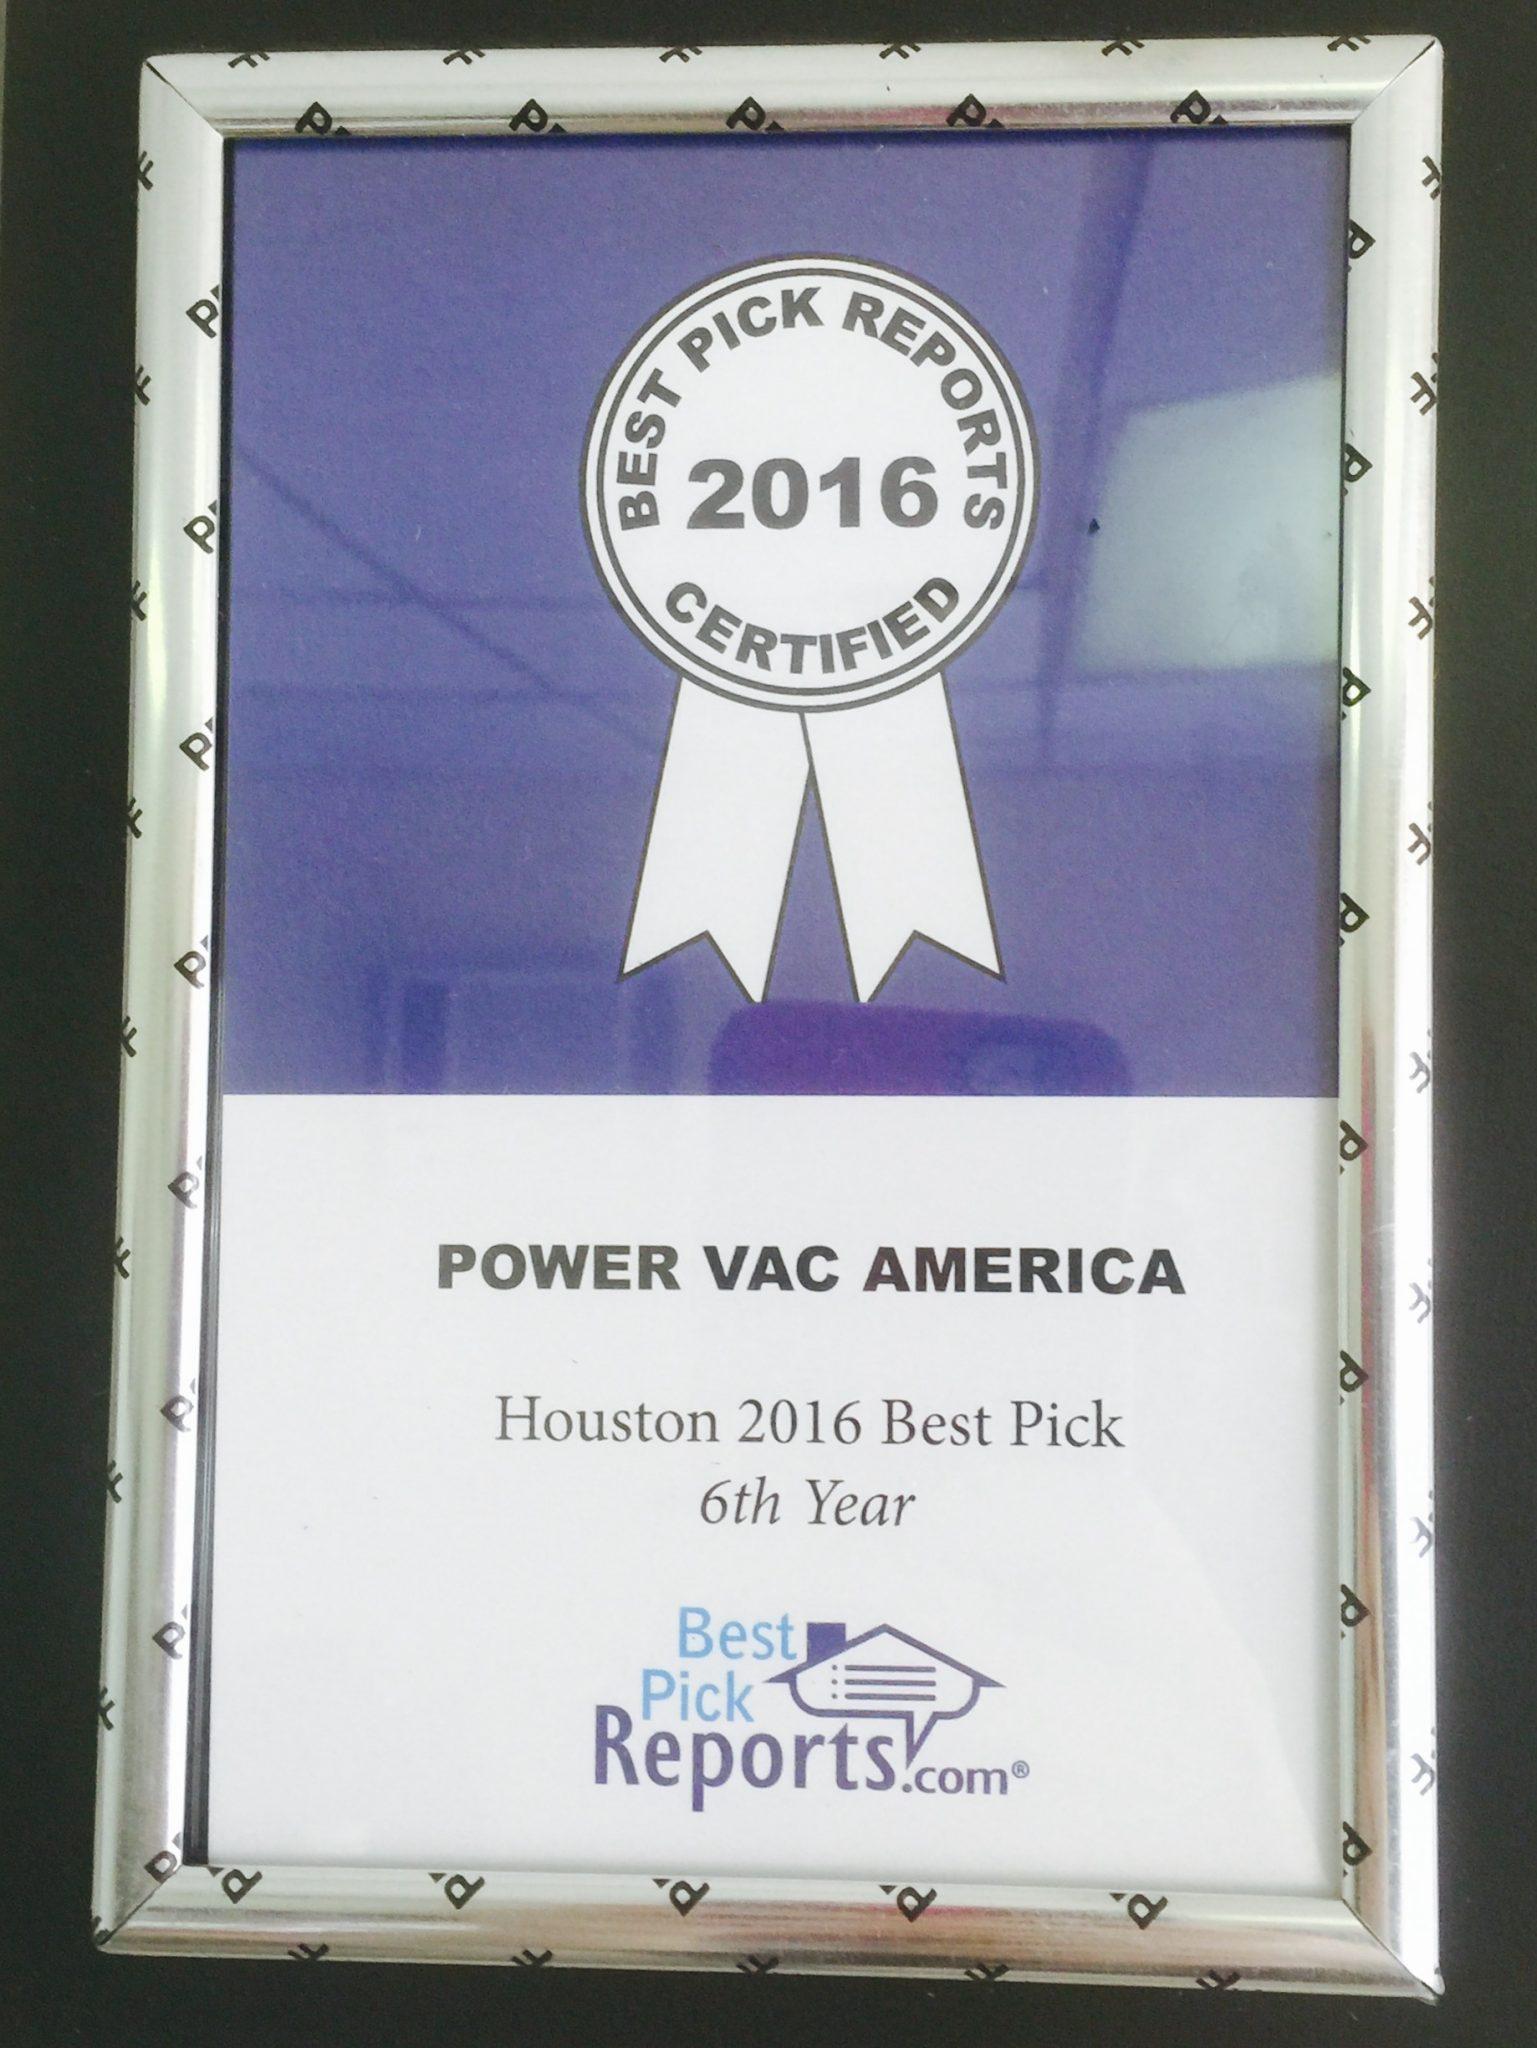 Best Picks Award 2016 Power Vac America